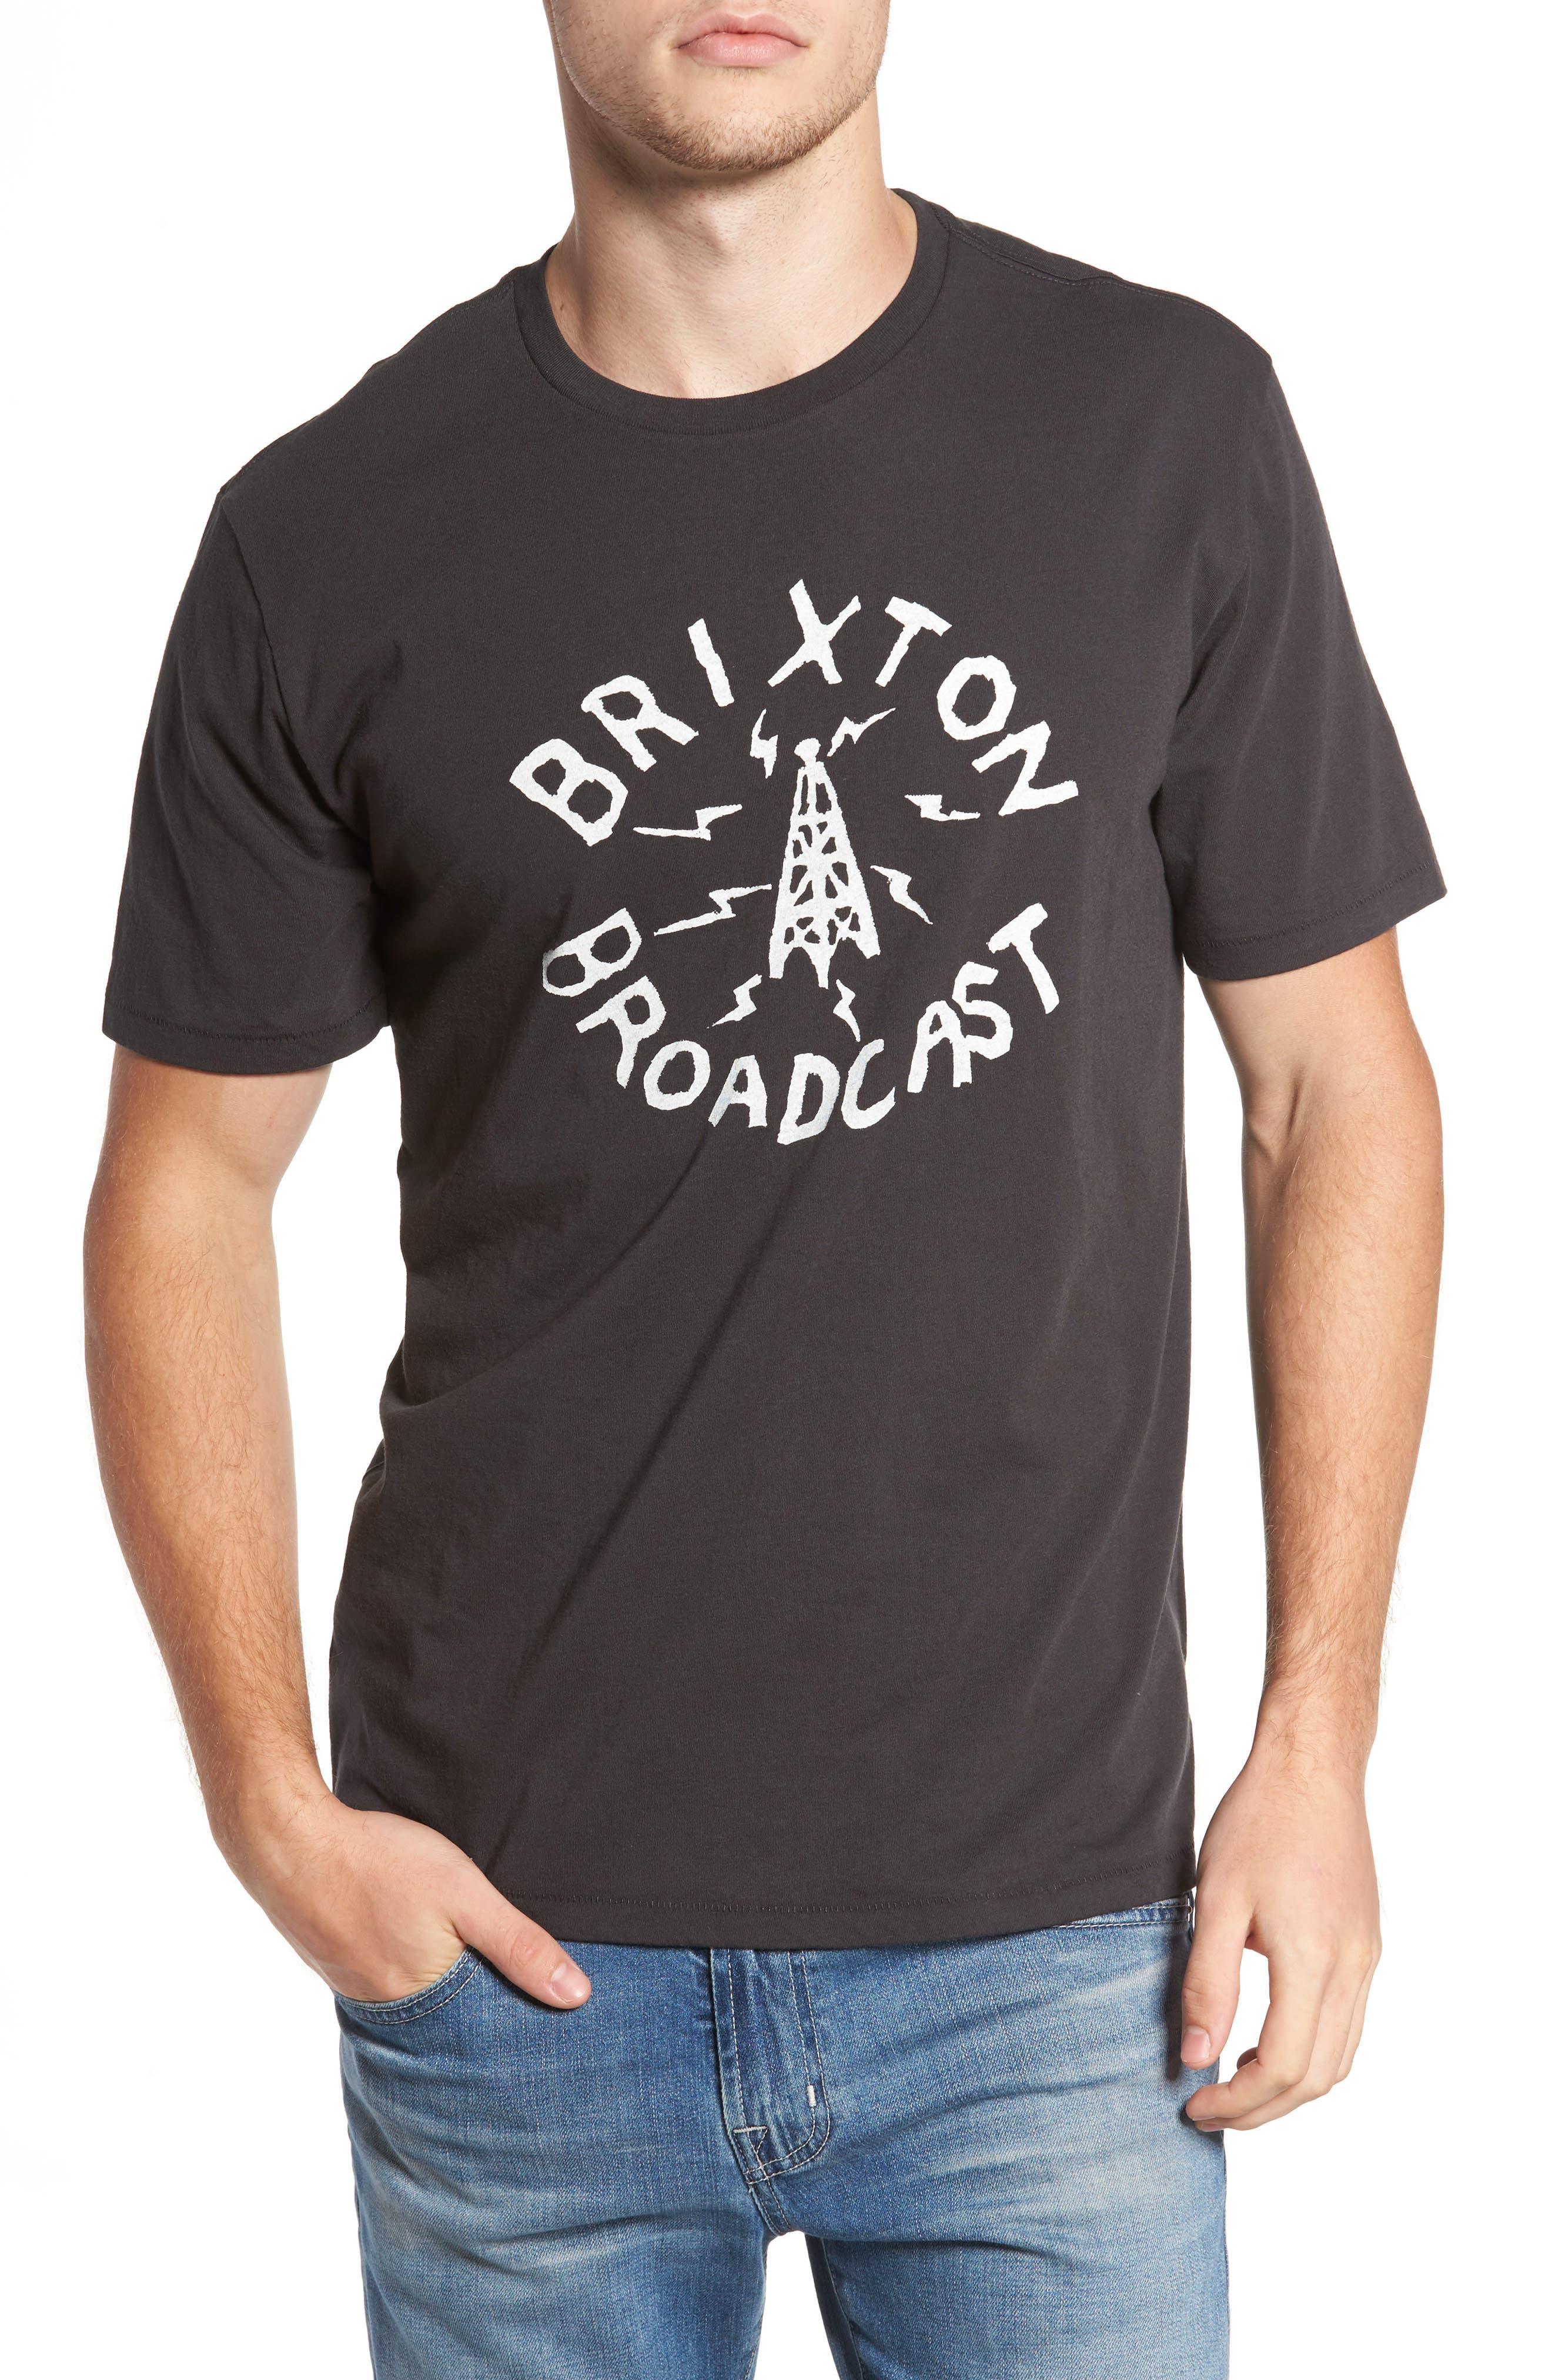 Broadcast T-Shirt,                             Main thumbnail 1, color,                             Washed Black